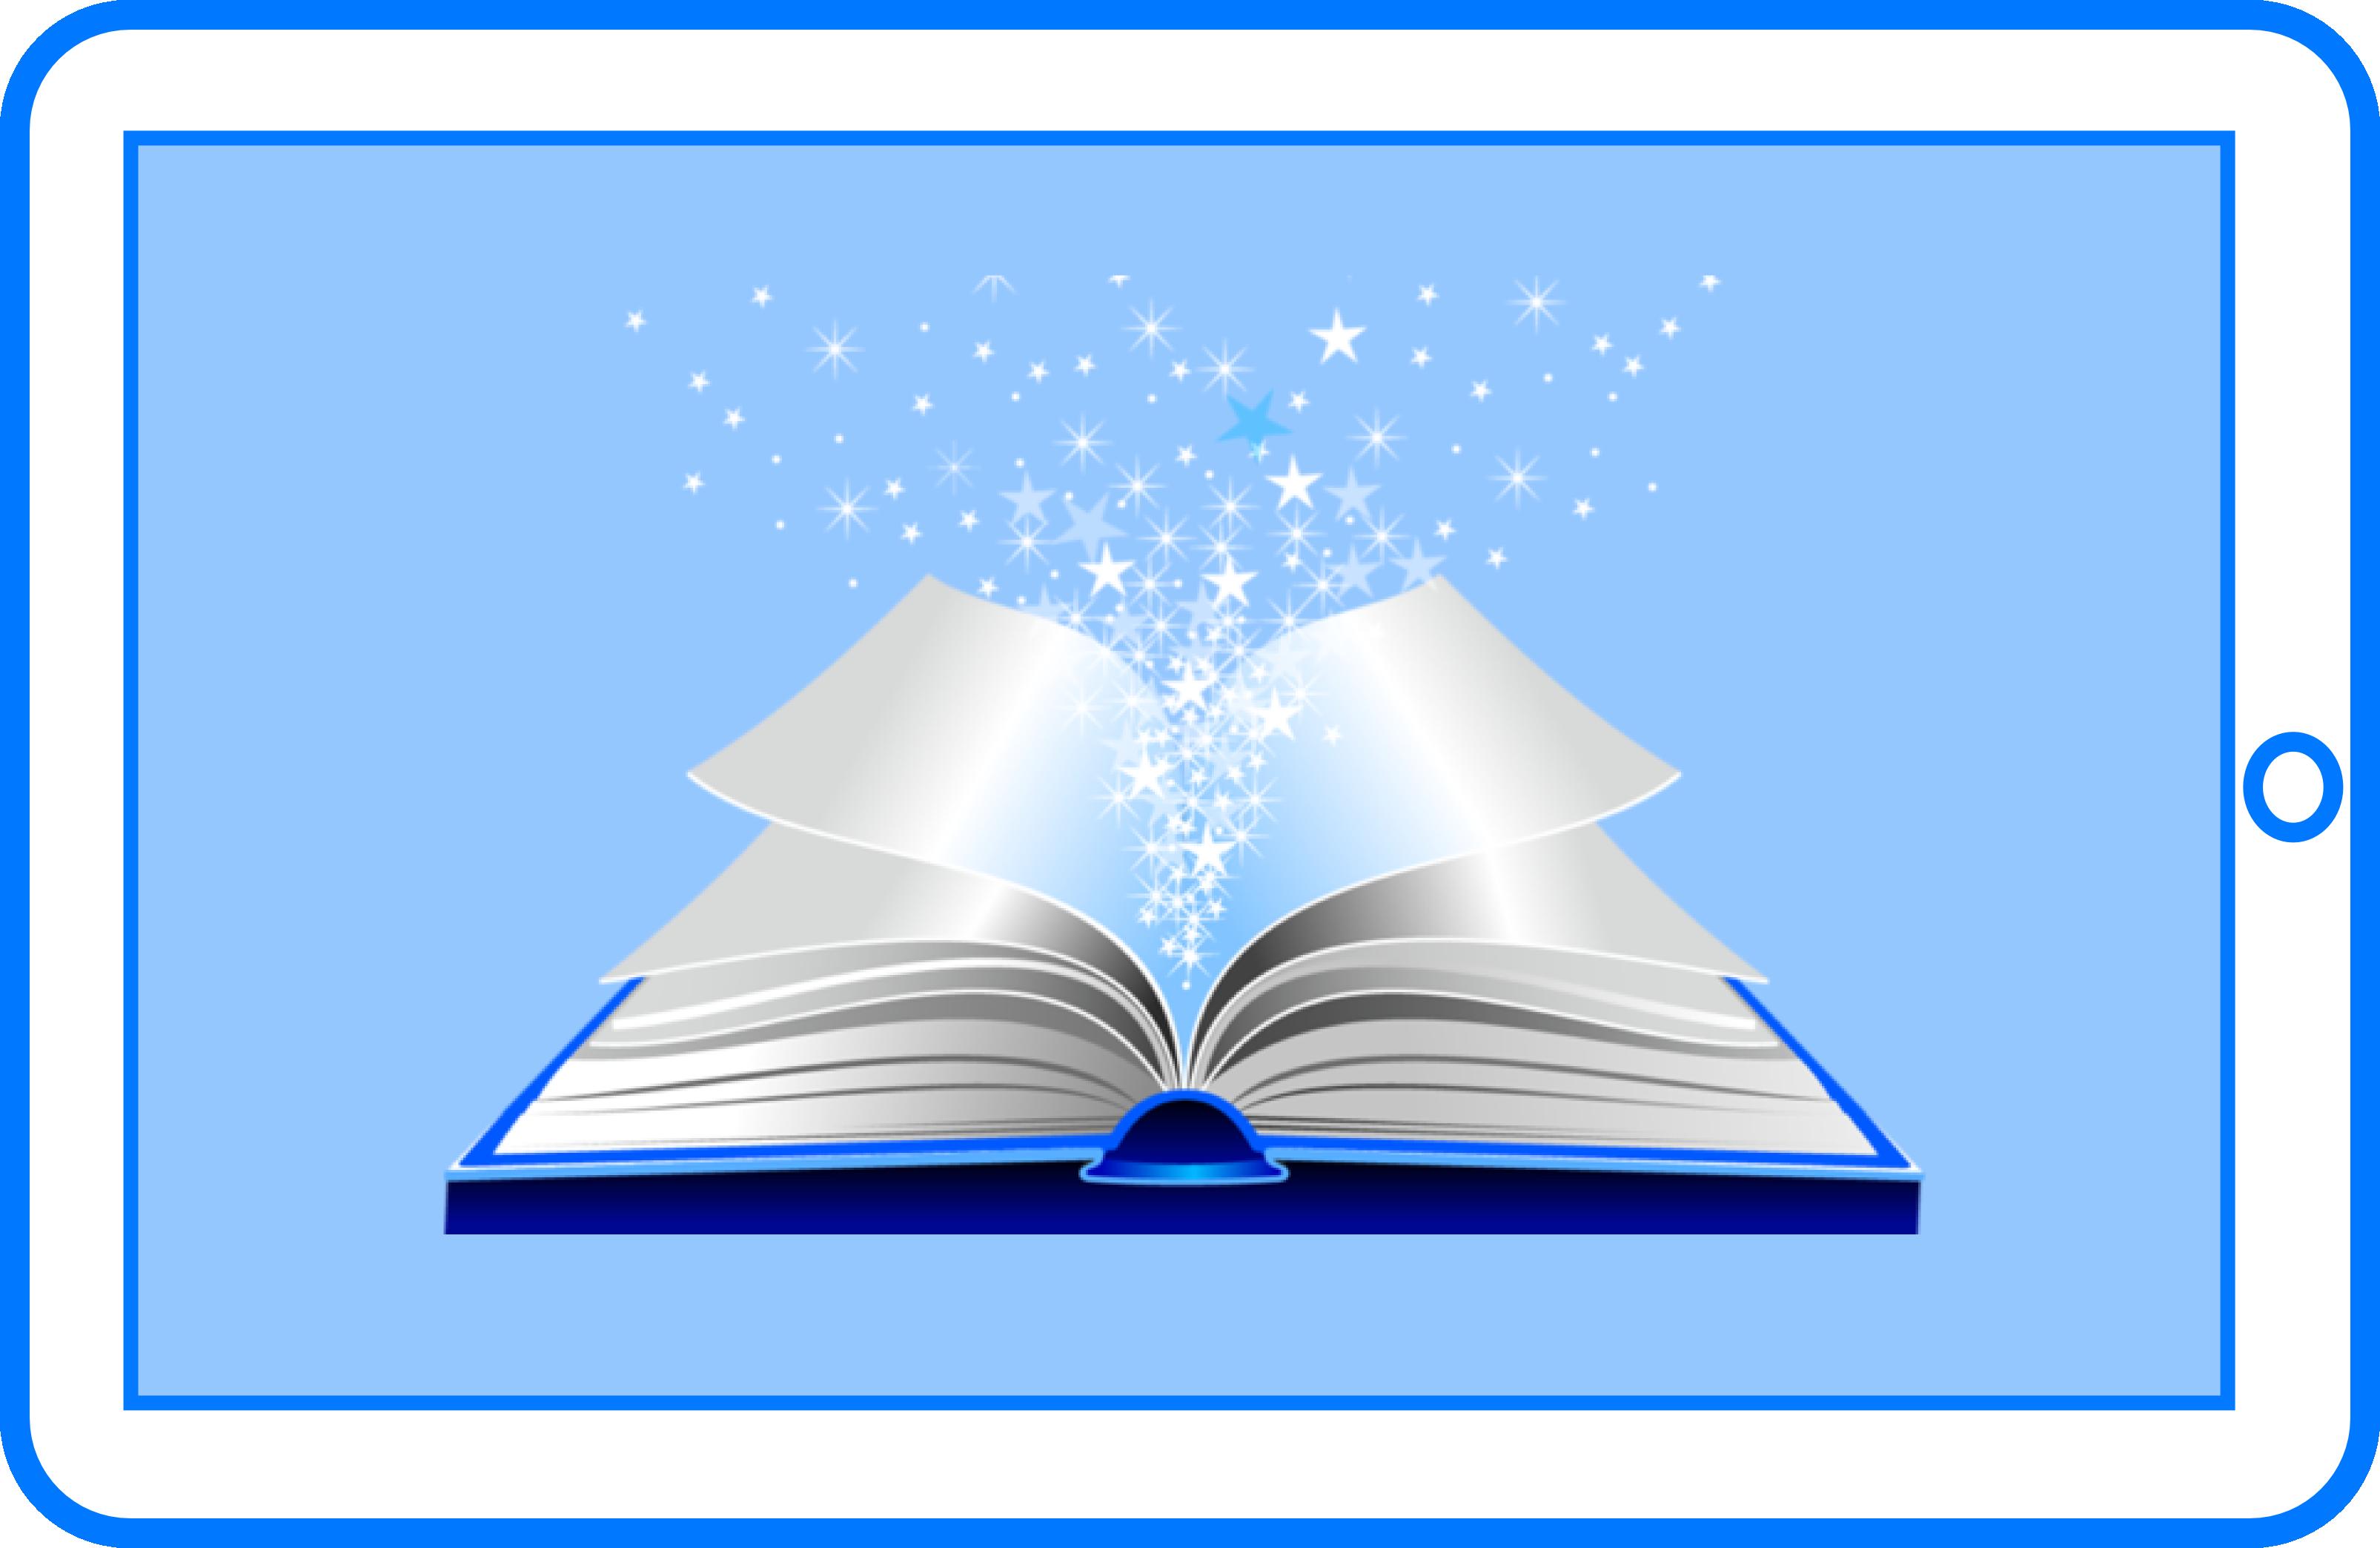 презентация библиотечная статистика